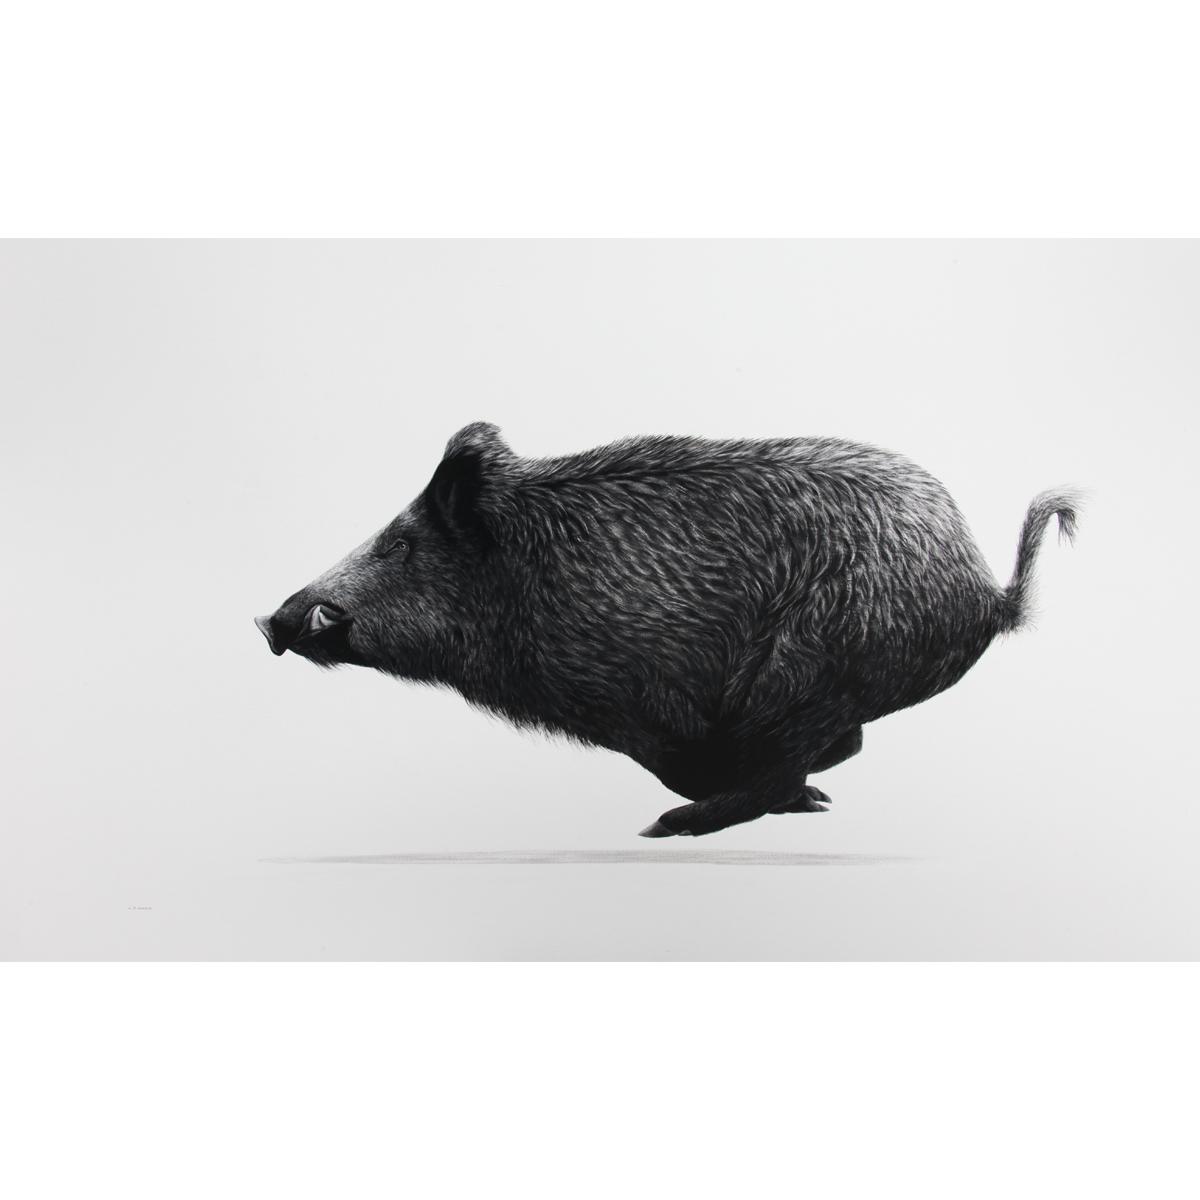 Keith Sykes – Running Boar Card